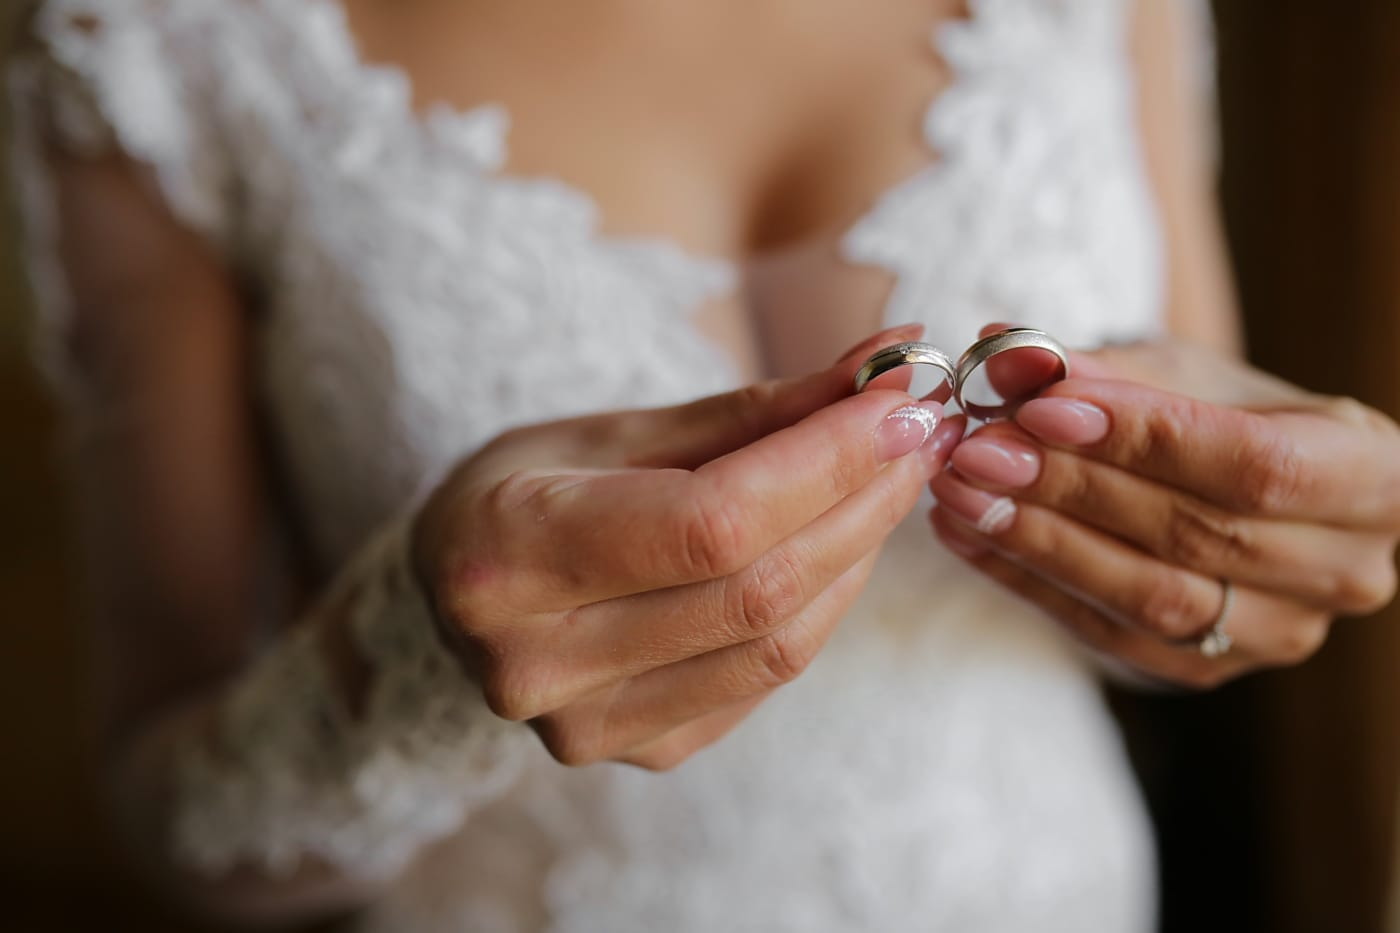 golden glow, wedding ring, manicure, bride, hands, woman, hand, finger, love, engagement